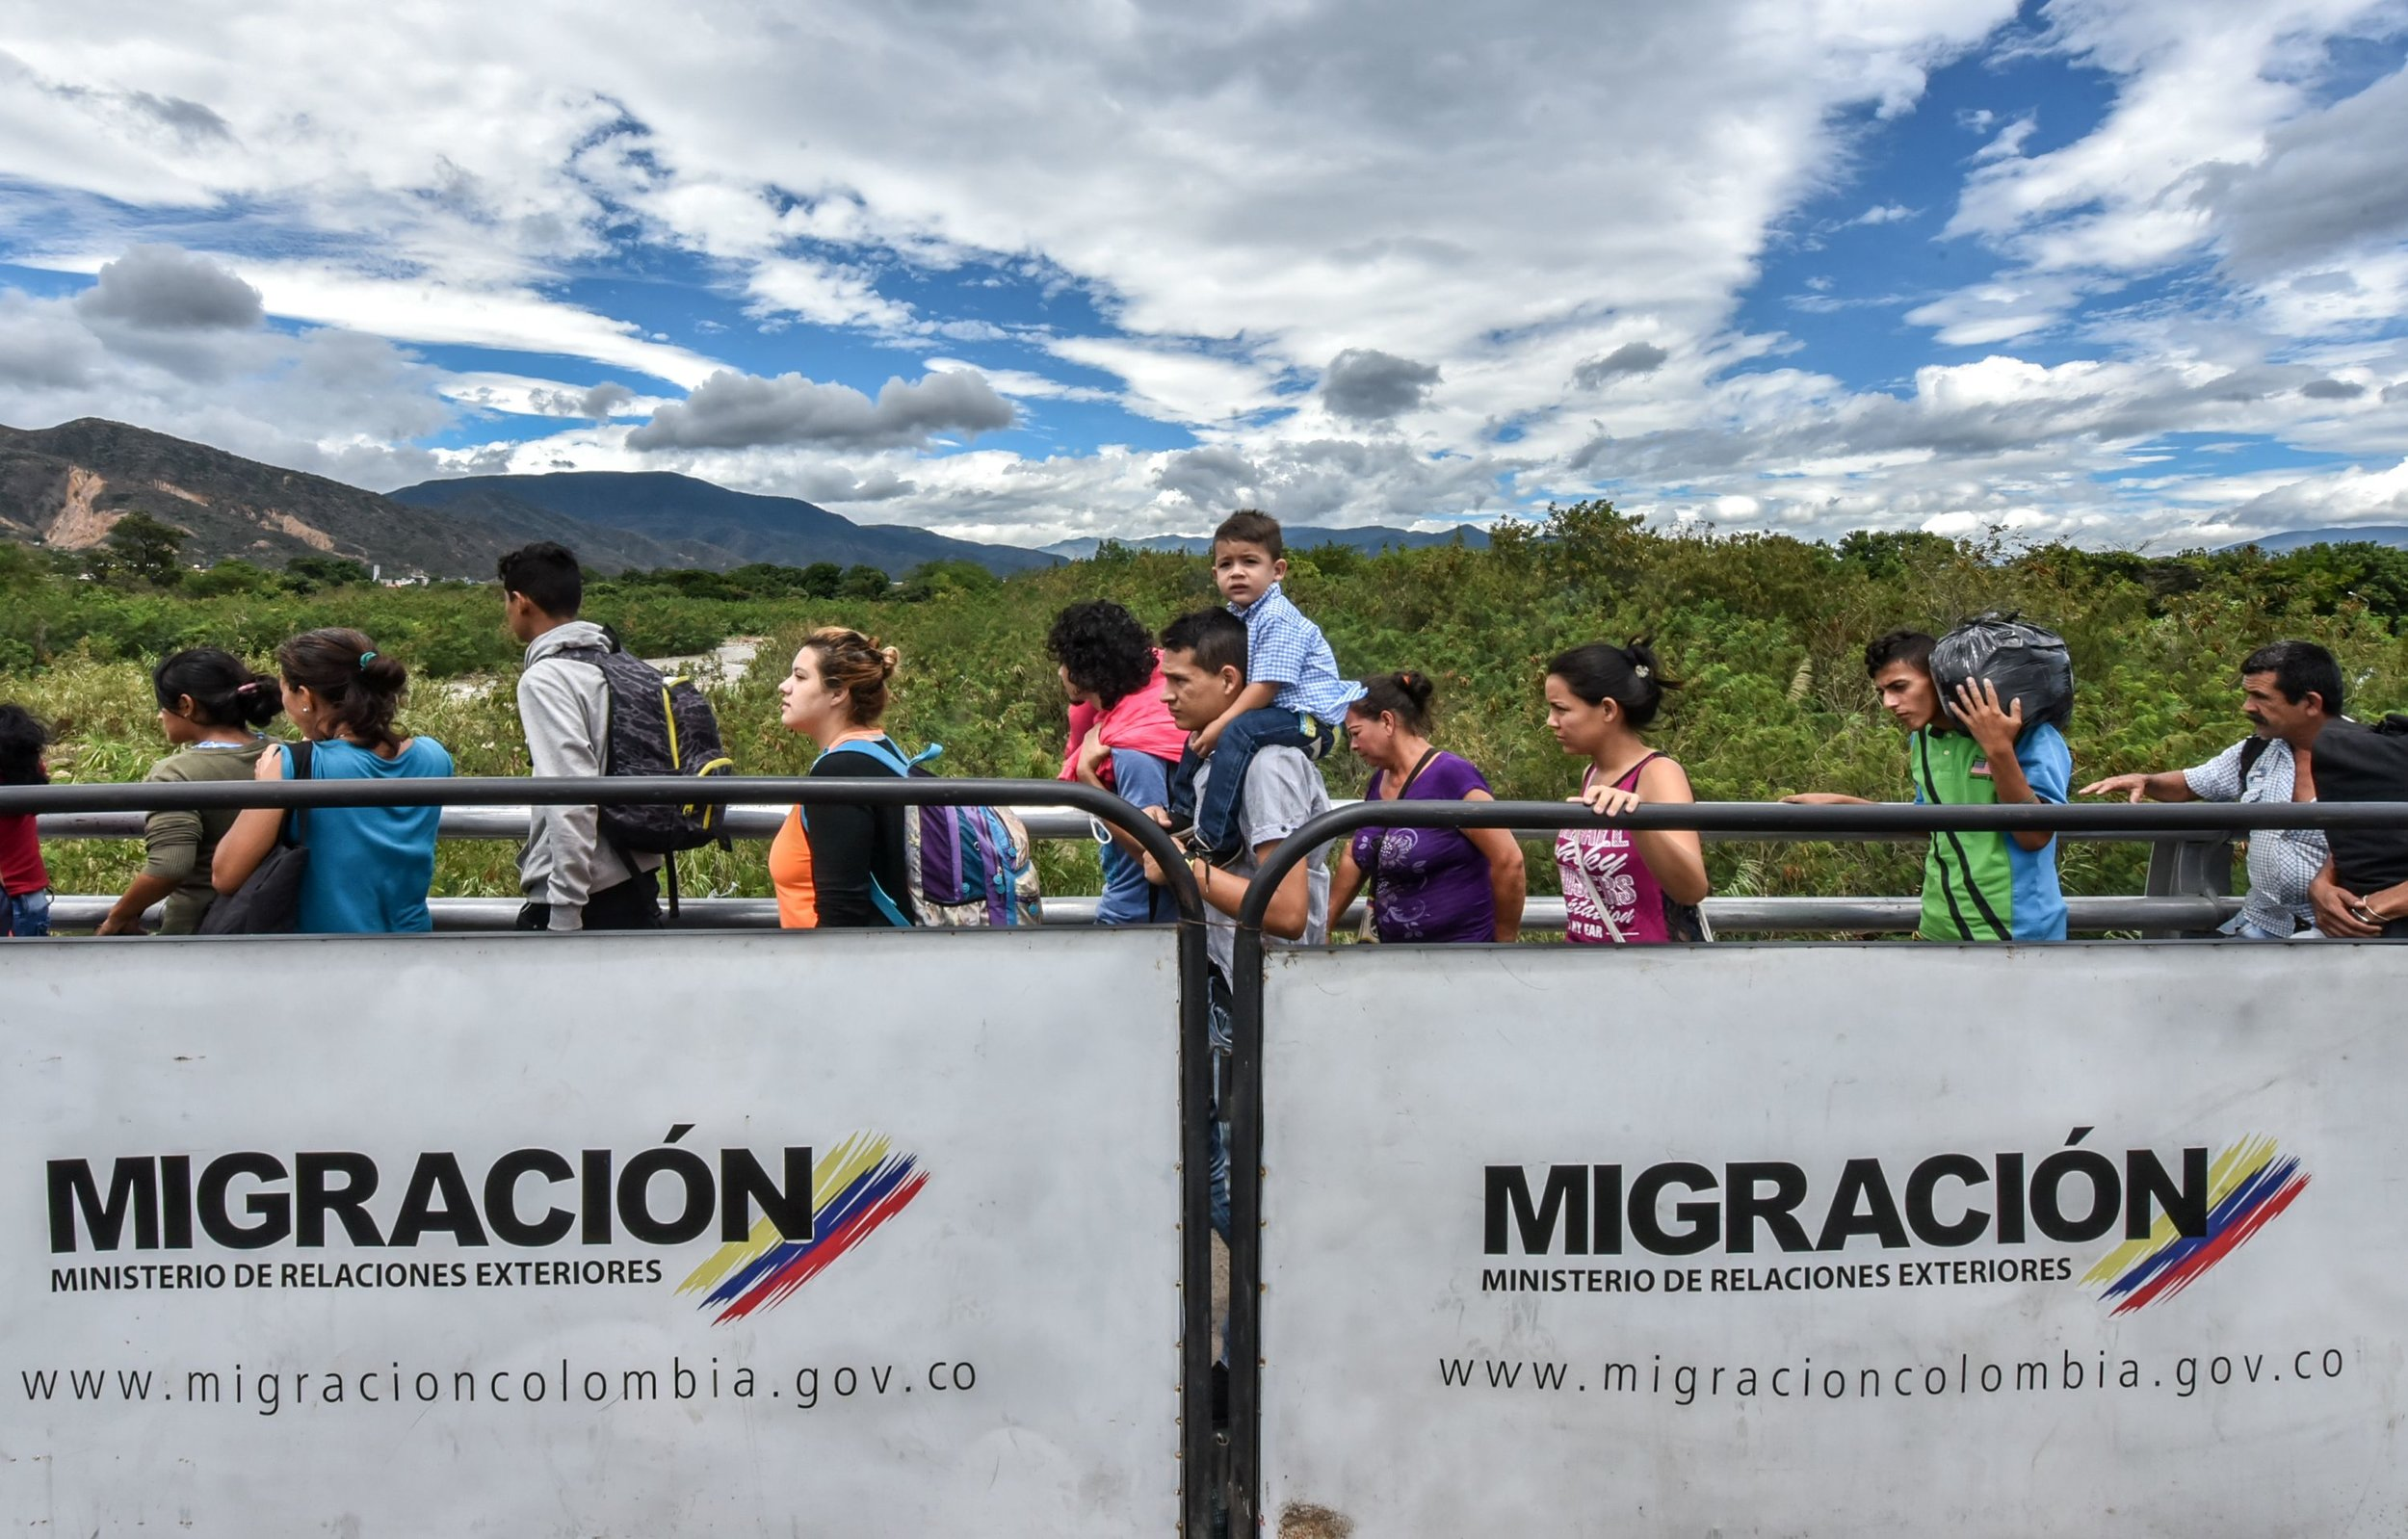 Venezuelans cross the Simon Bolivar international bridge from Venezuela to Colombia. Photo Credit: LUIS ACOSTA/AFP/Getty Images.